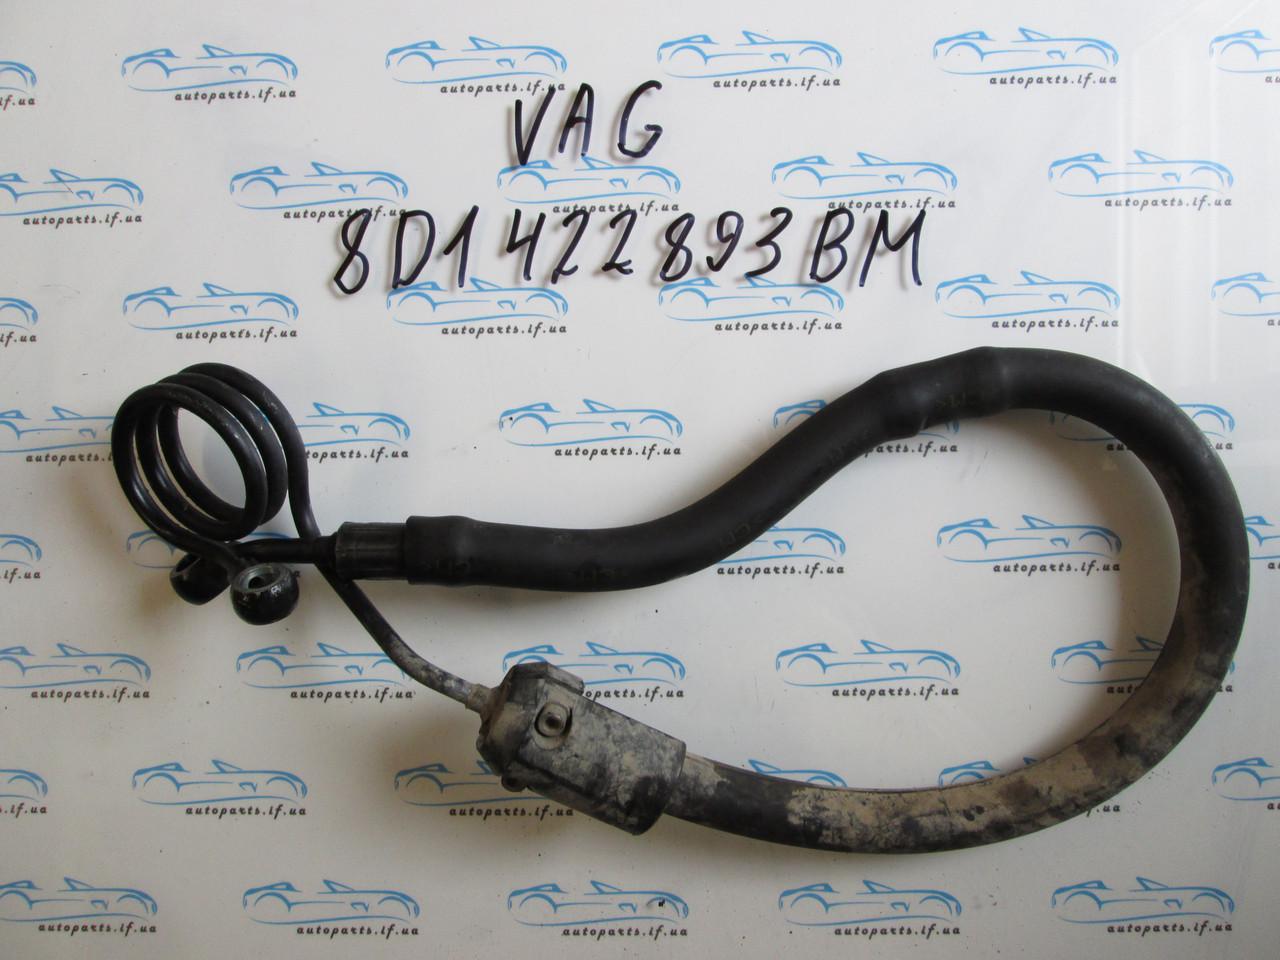 Шланг гидроусилителя VAG 8D1422893BM